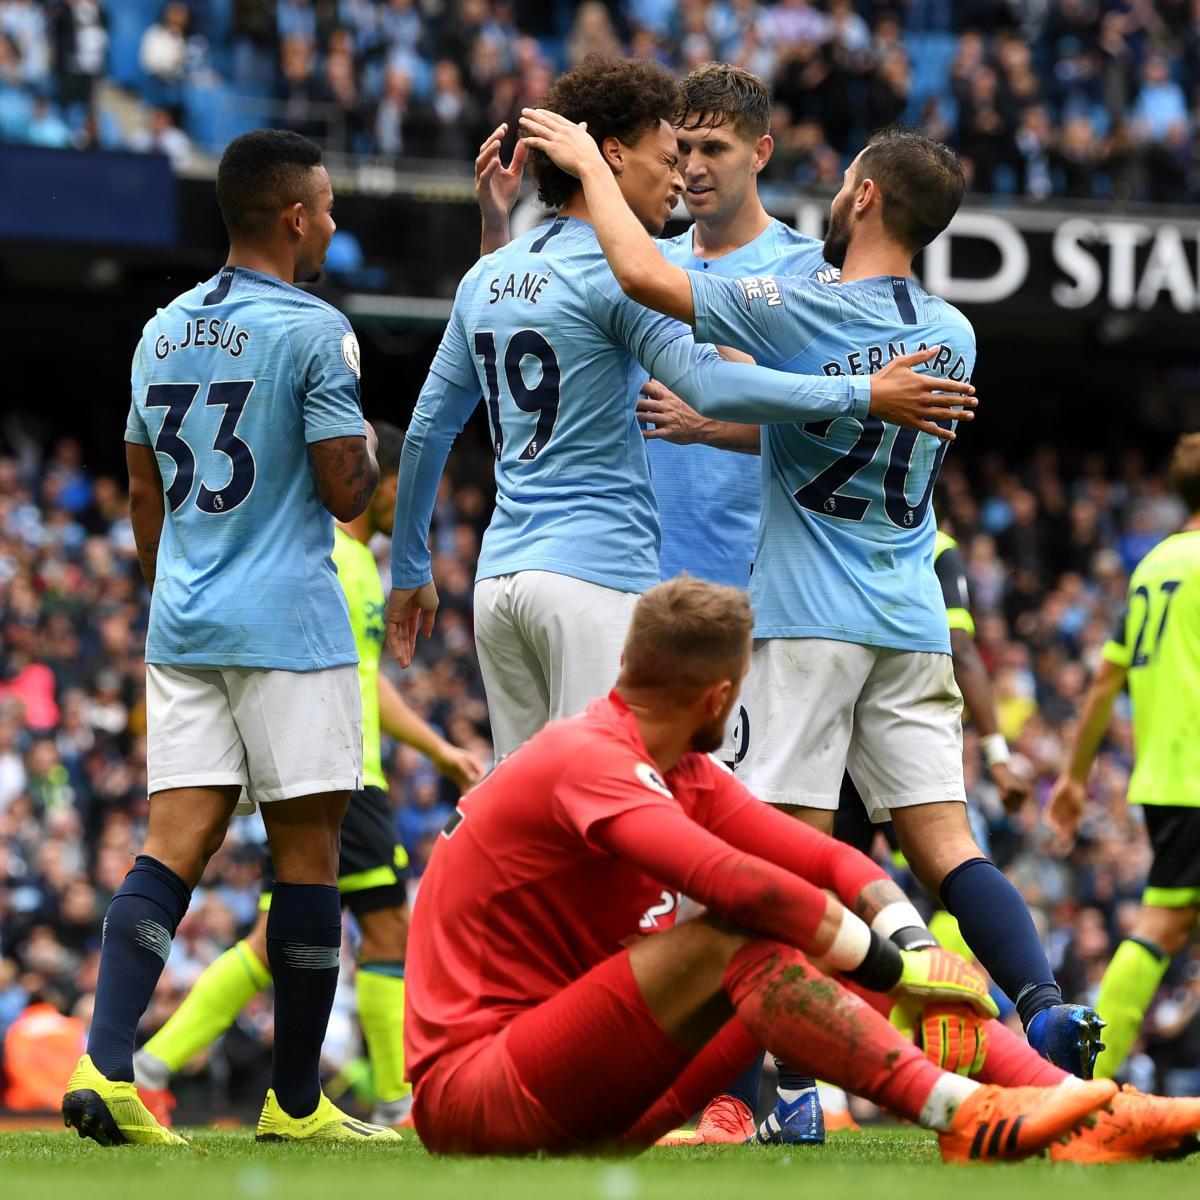 Premier League 2018 19 Live: EPL Table: 2018 Week 2 Standings After Sunday's Premier